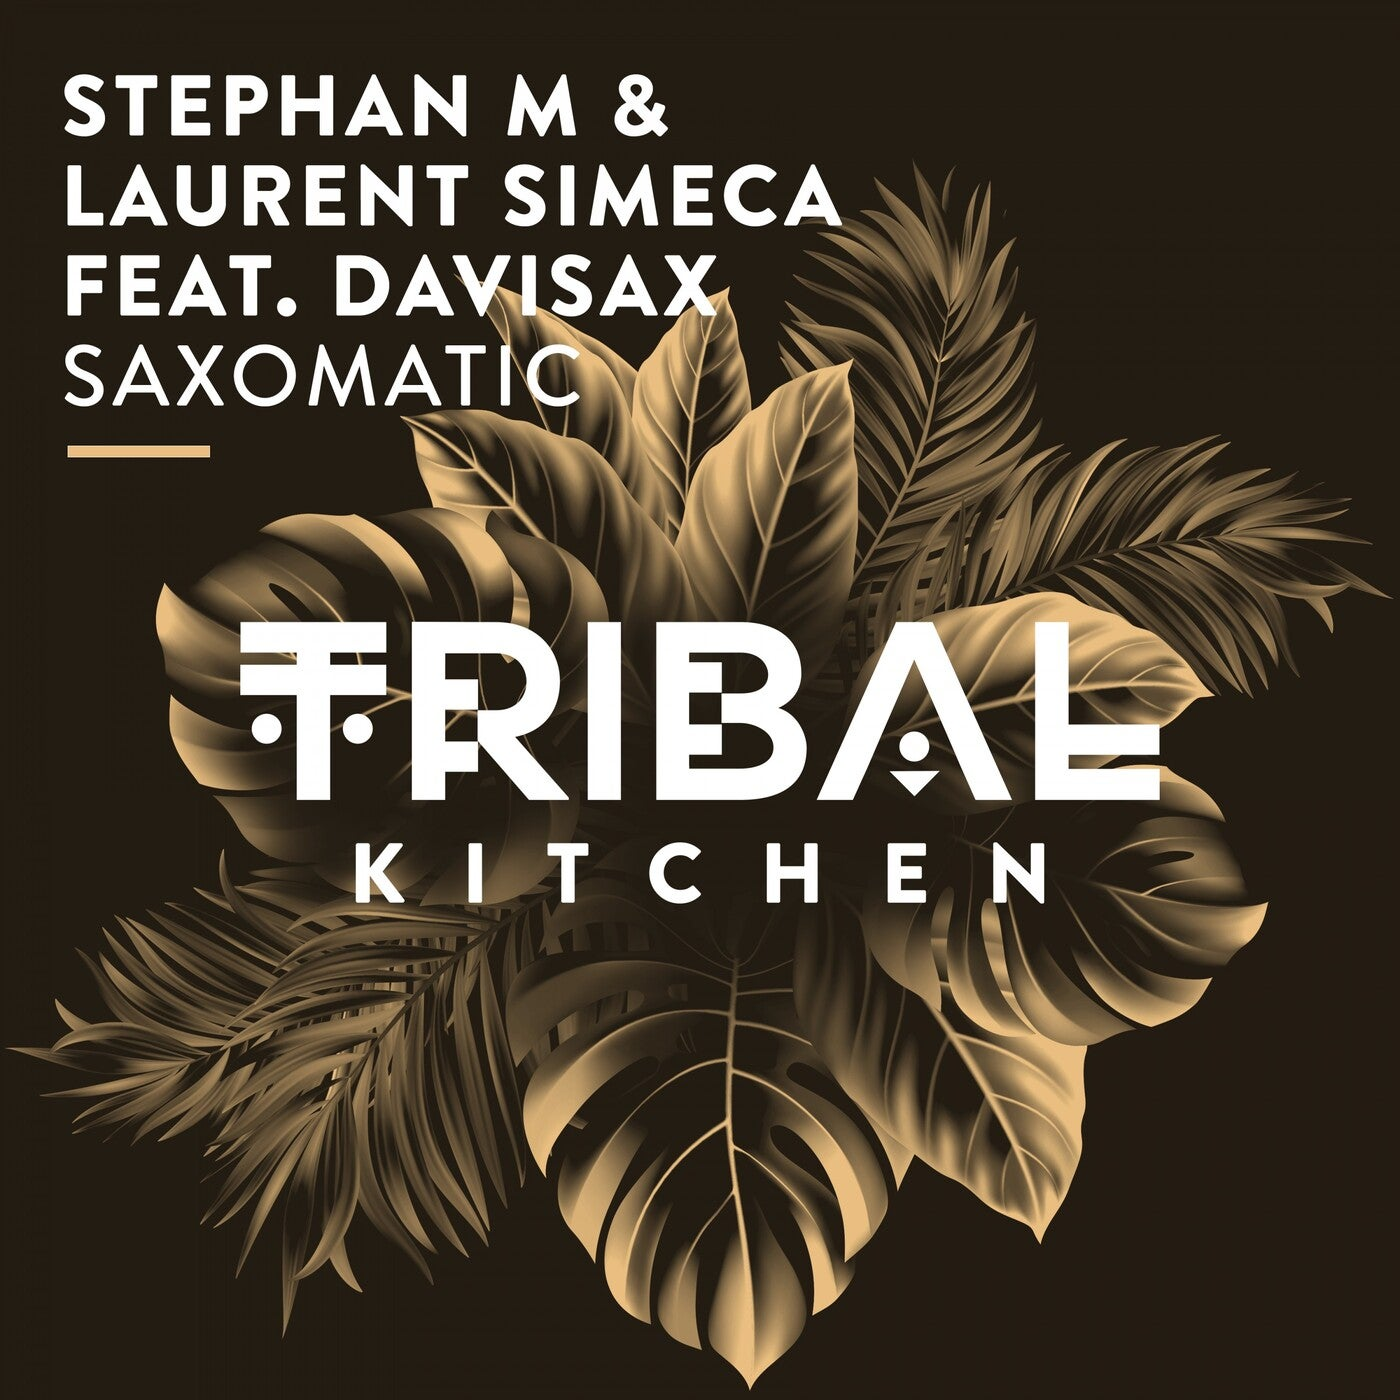 Saxomatic feat. DaviSax (Original Mix)